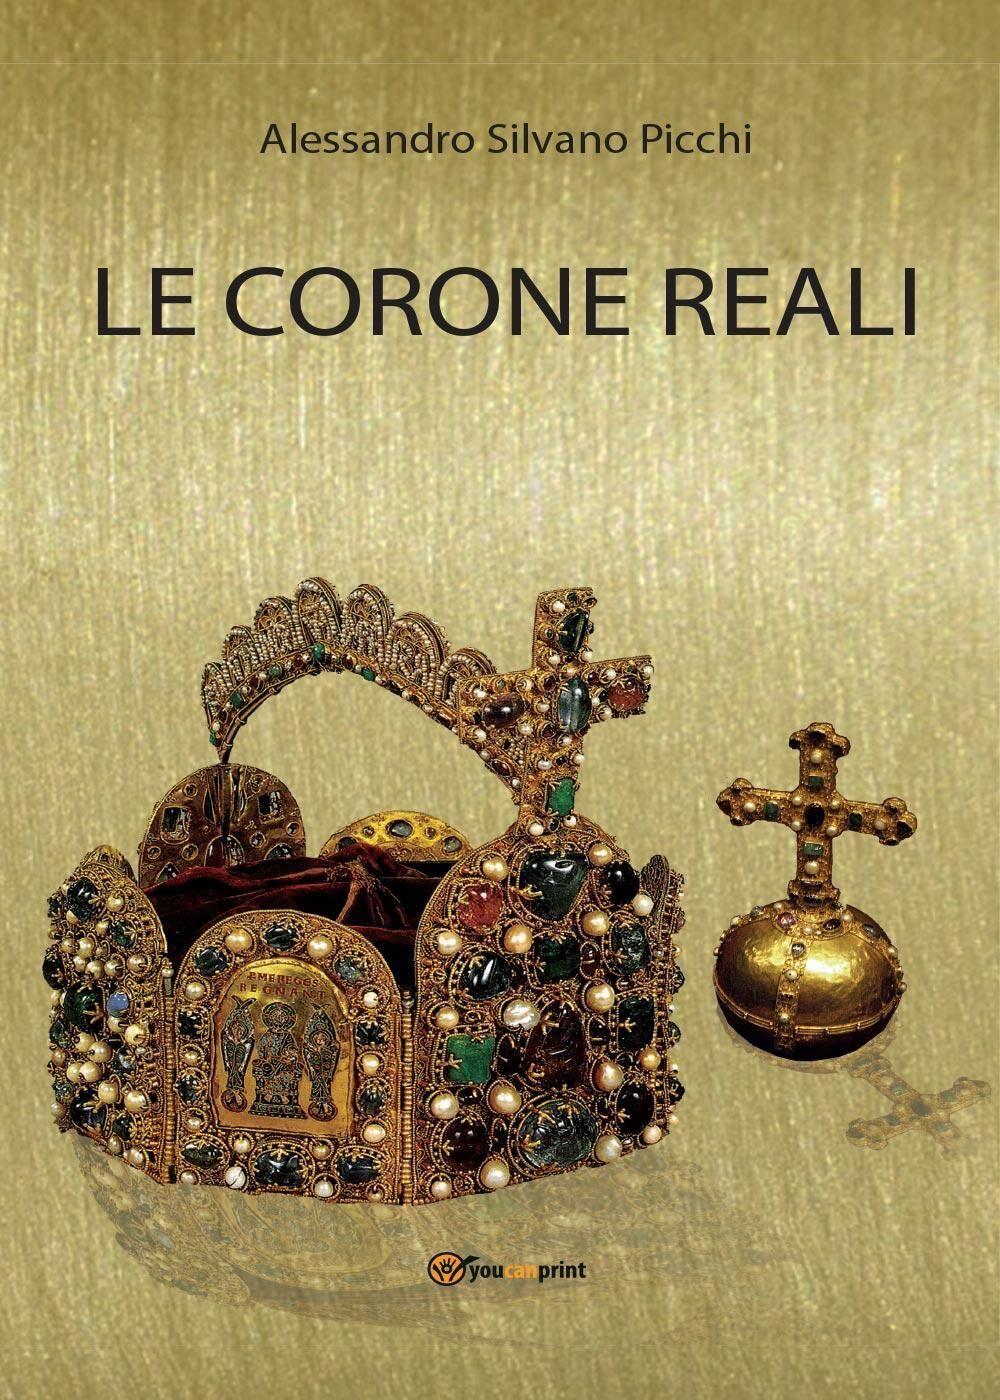 Le corone reali